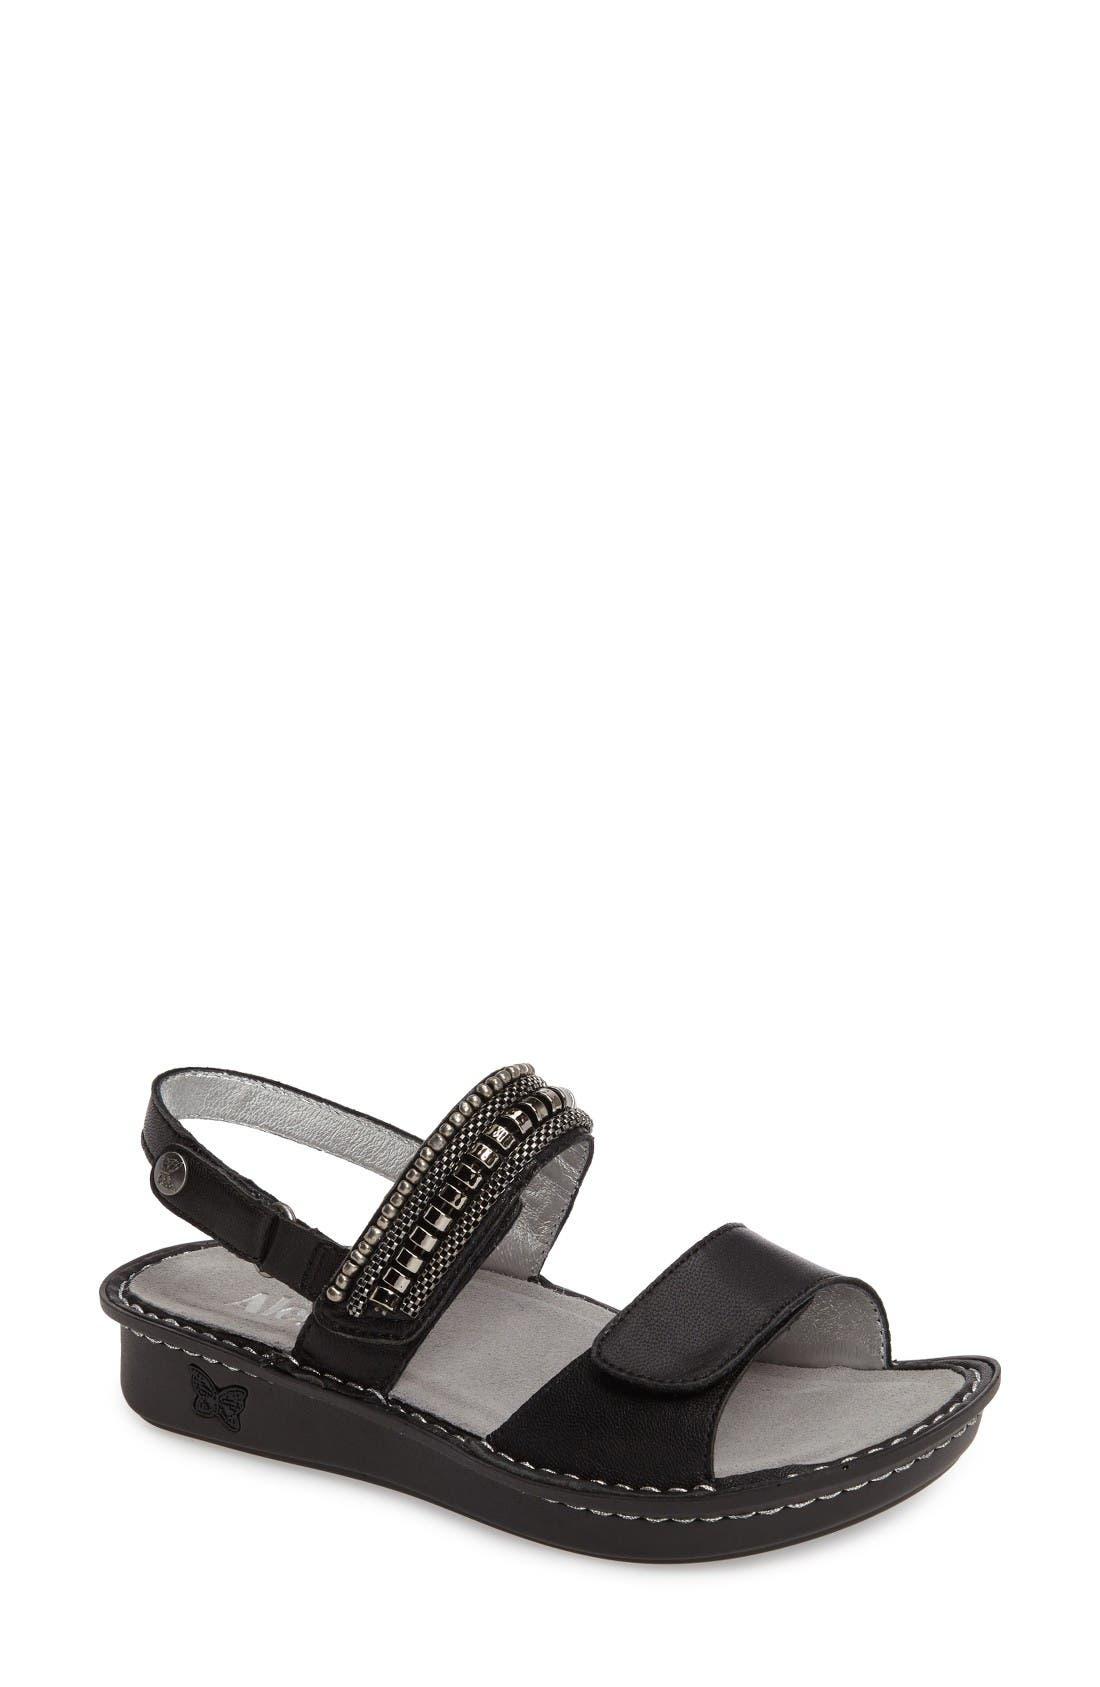 'Verona' Sandal,                         Main,                         color, Coal Chain Gang Leather